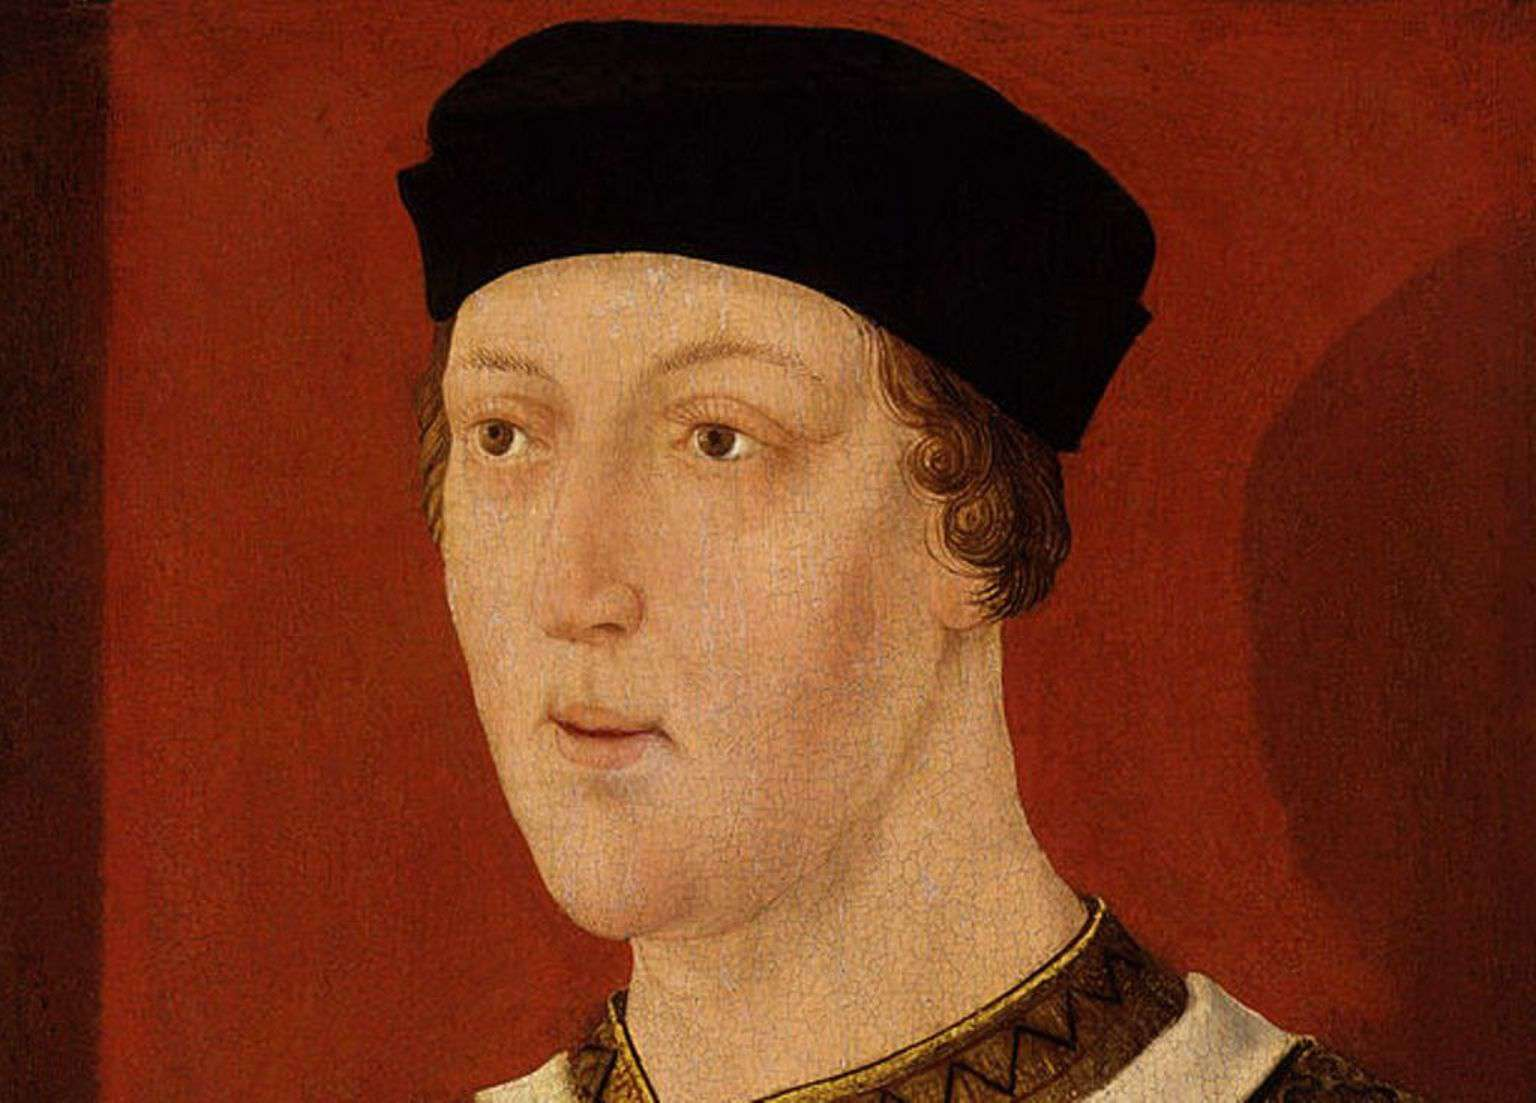 Portrait of King Henry VI of England wearing a black hat.